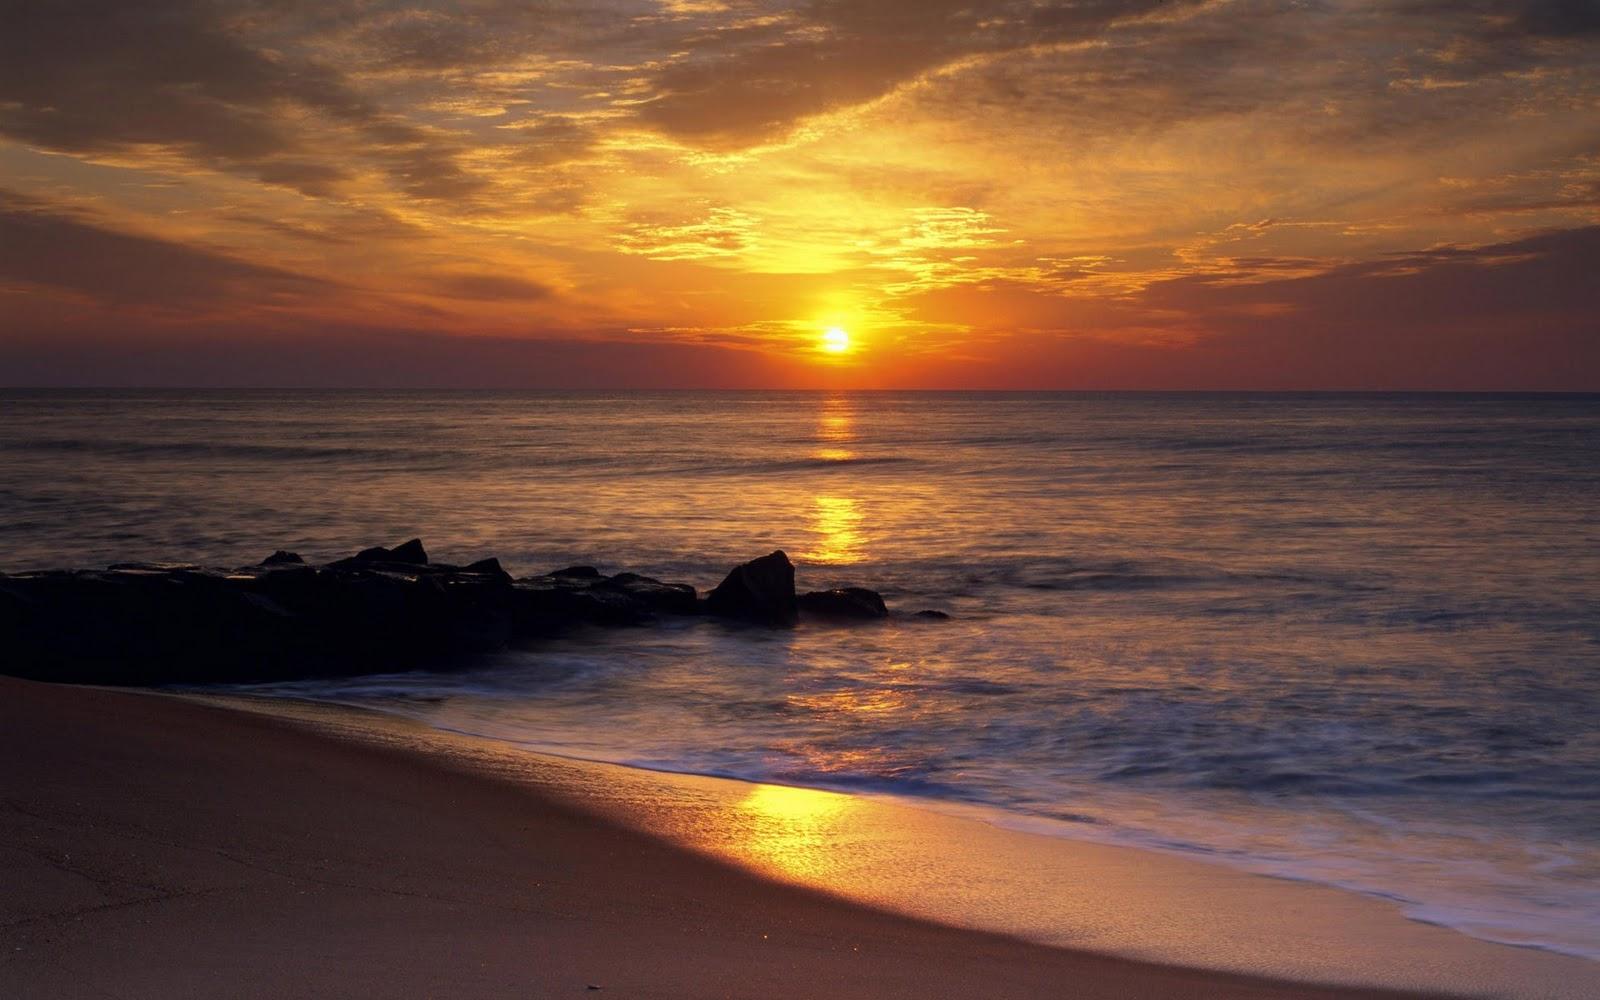 http://4.bp.blogspot.com/-GIUJVBjzu2c/TrZxR6tymZI/AAAAAAAAUrw/JJ9J_WgGtjM/s1600/Sunset+Wallpapers+%252822%2529.jpg